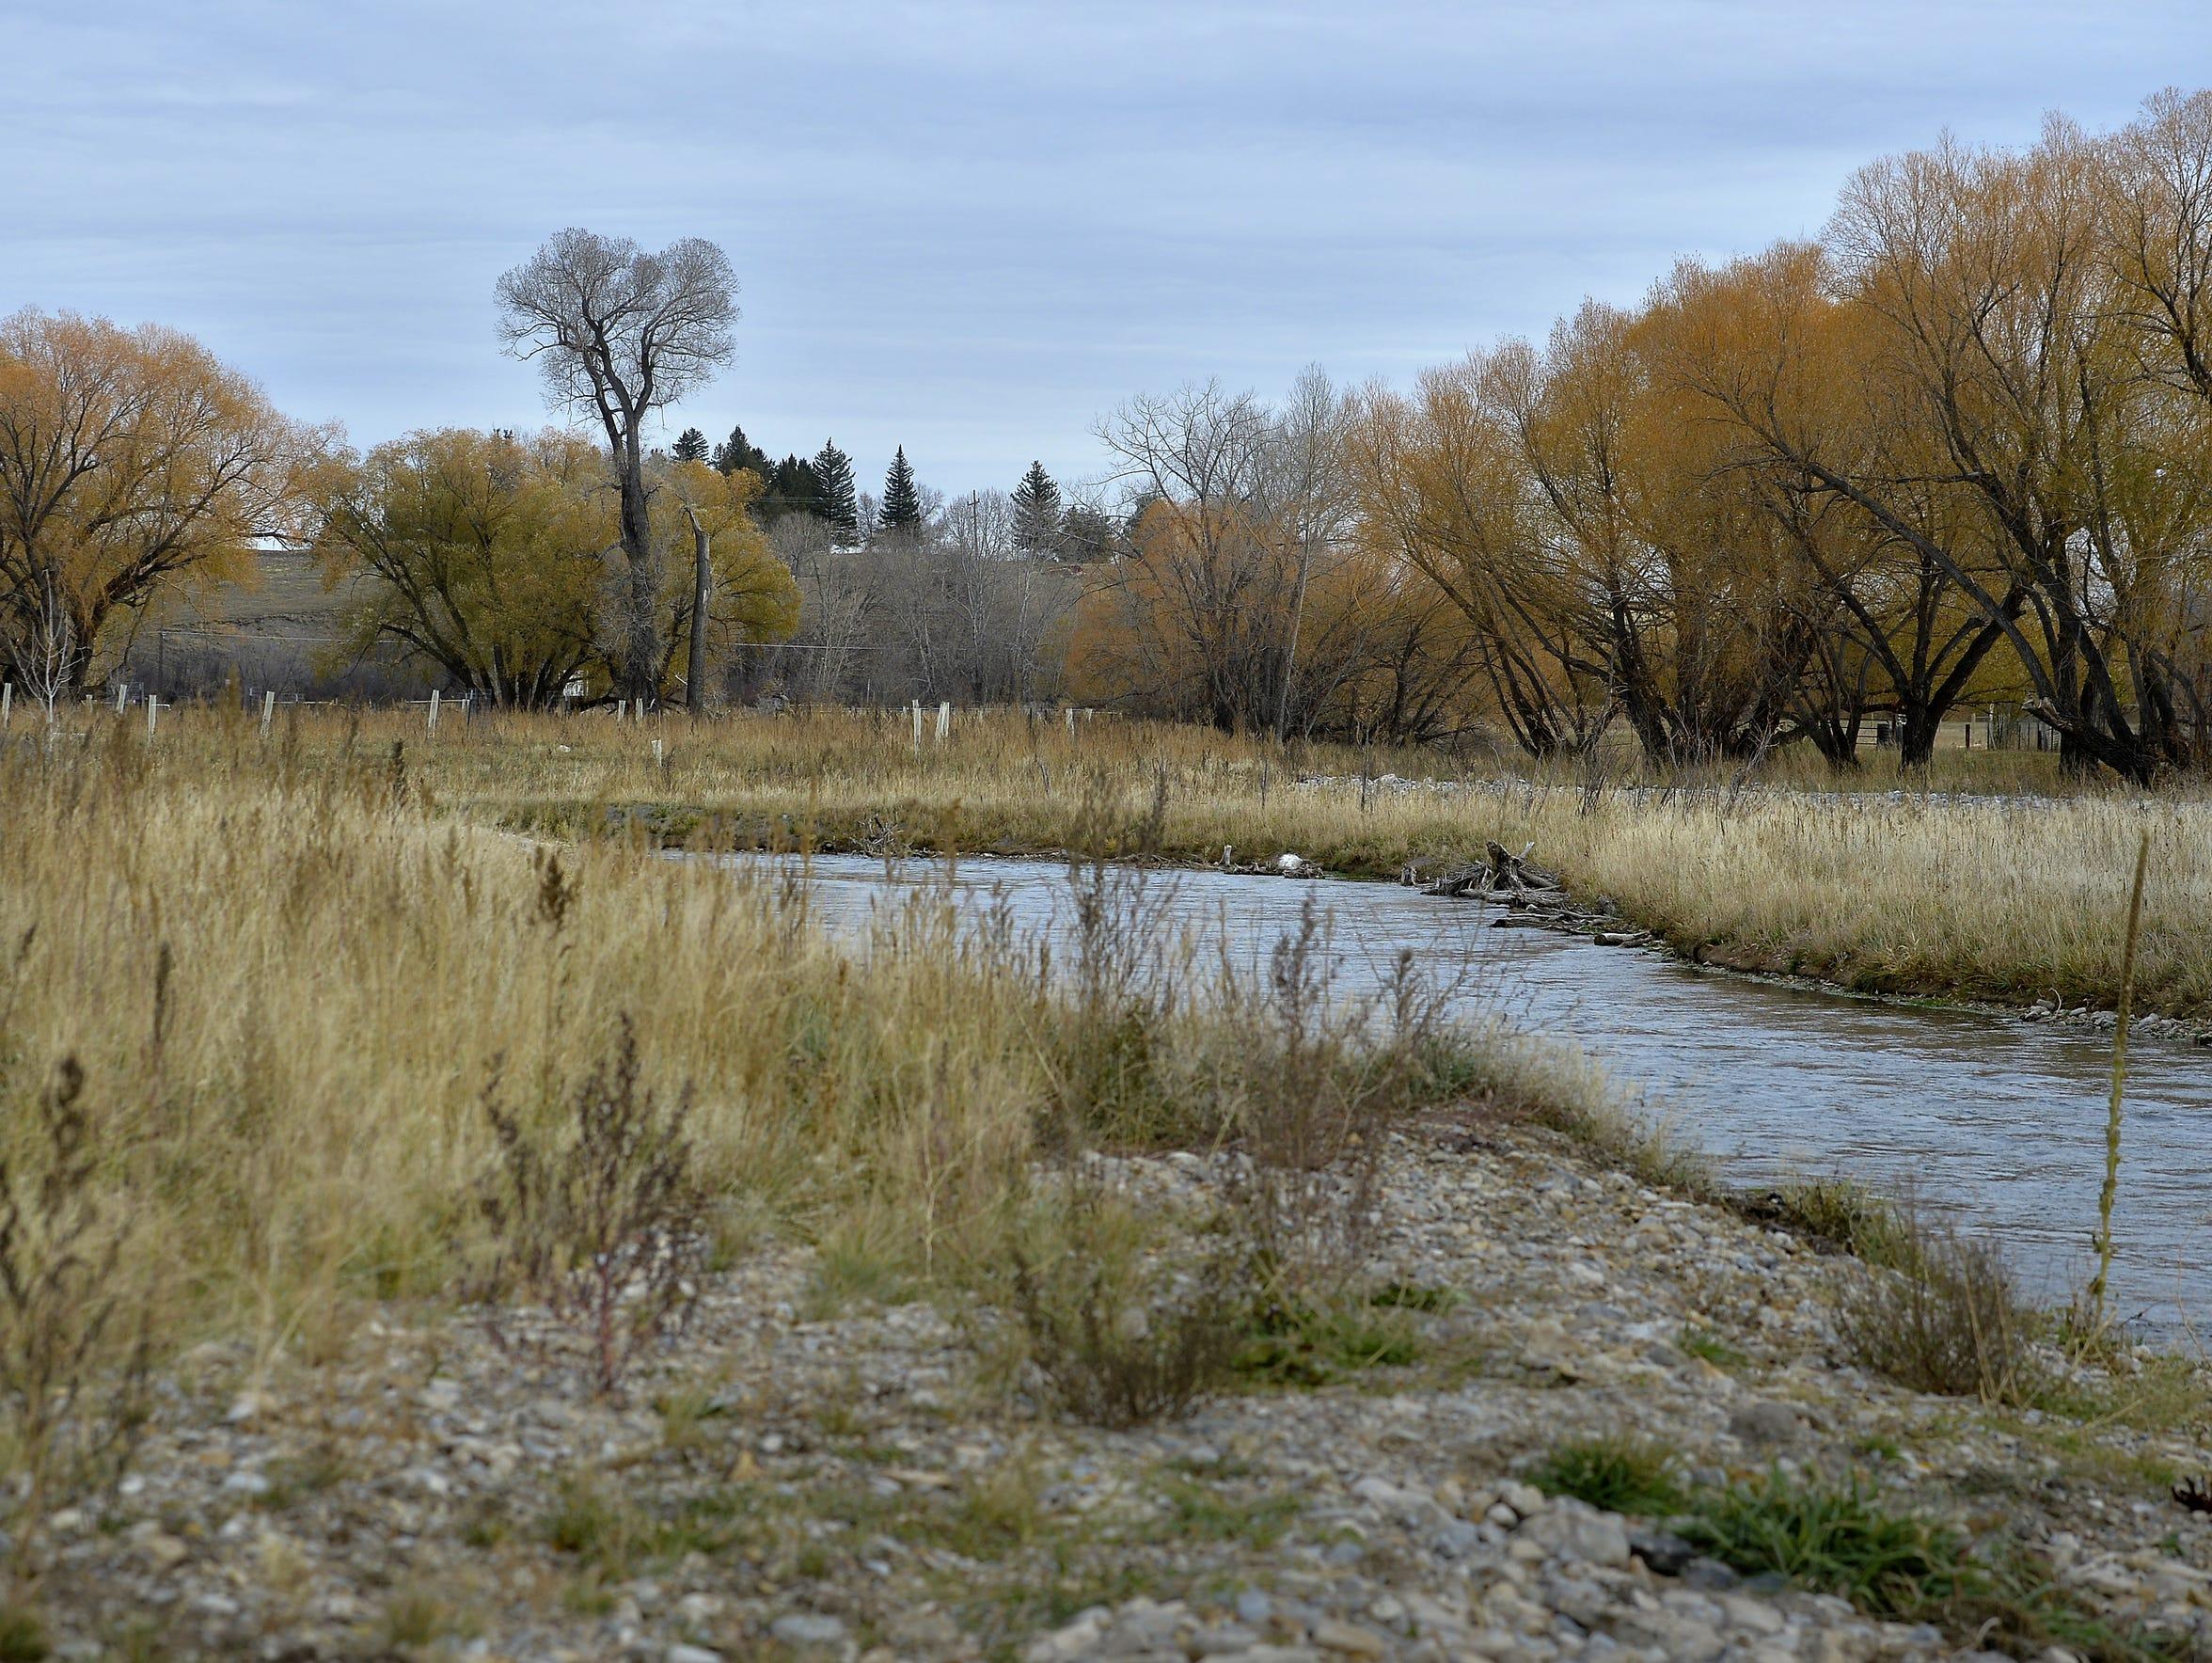 Big Spring Creek near U.S. Highway 191 has several